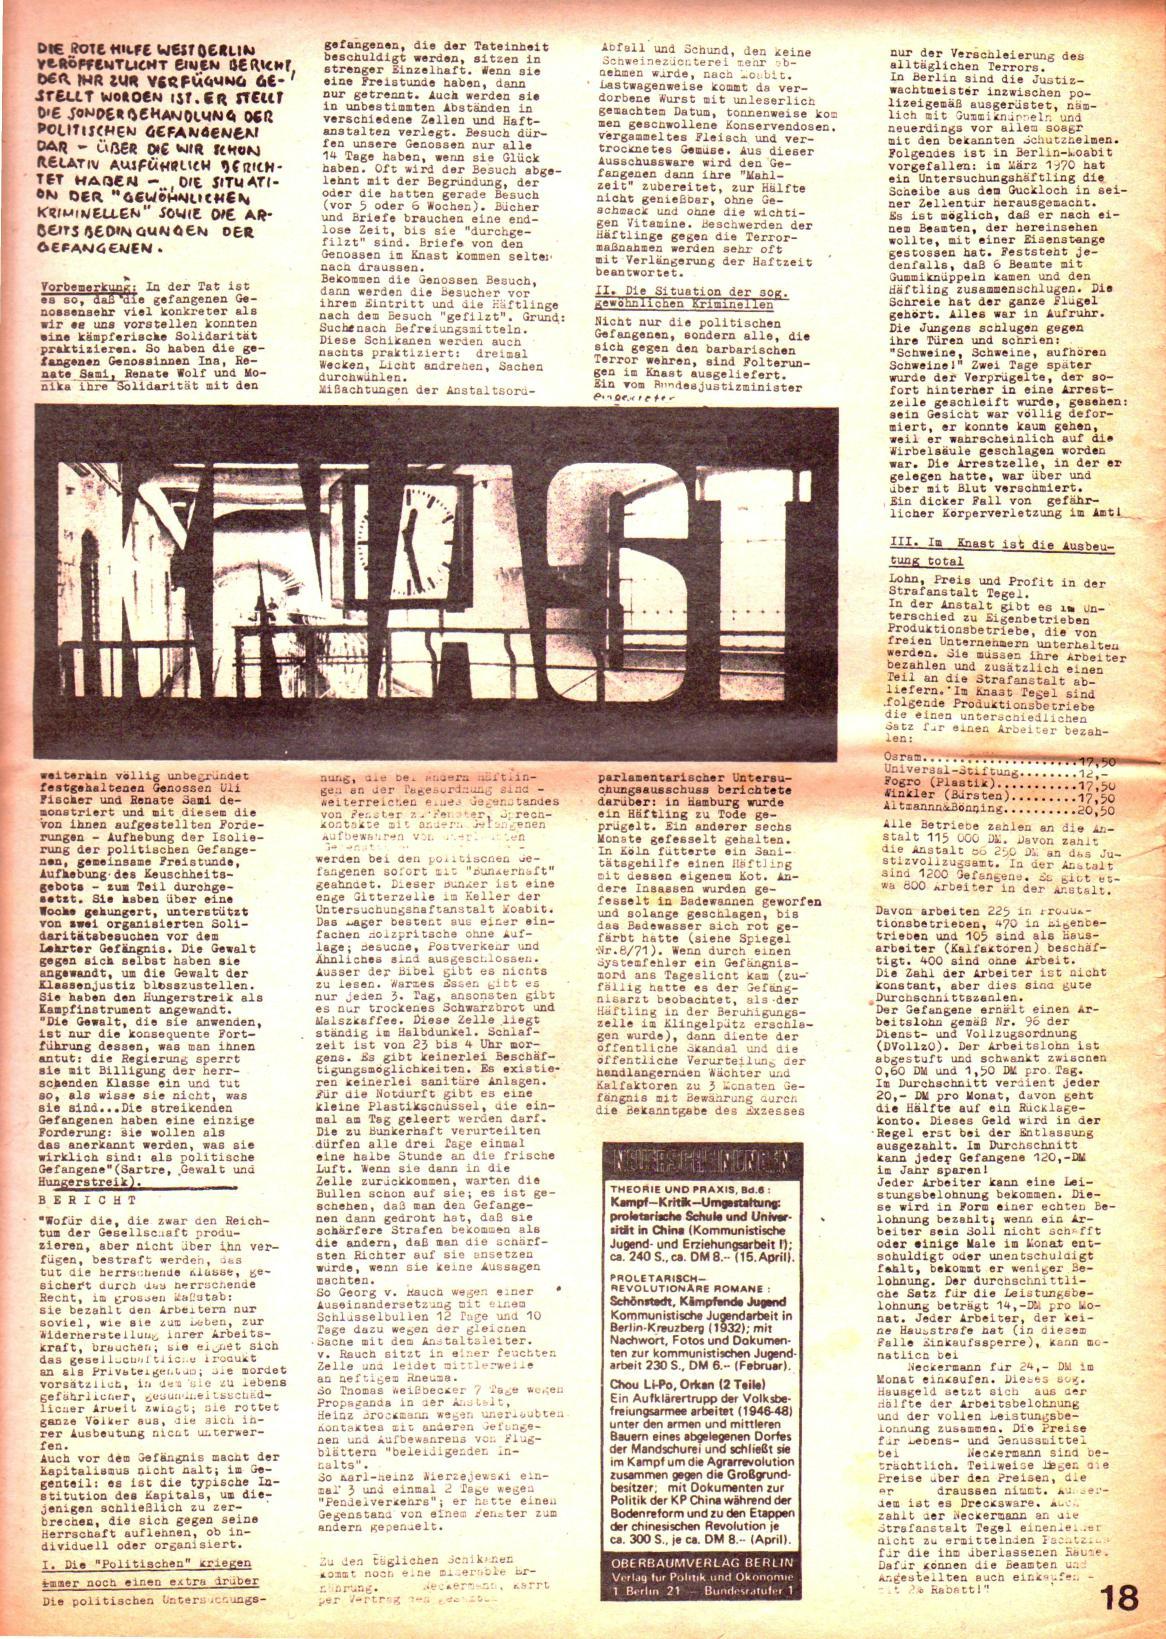 Berlin_Hochschulkampf_1971_09_18